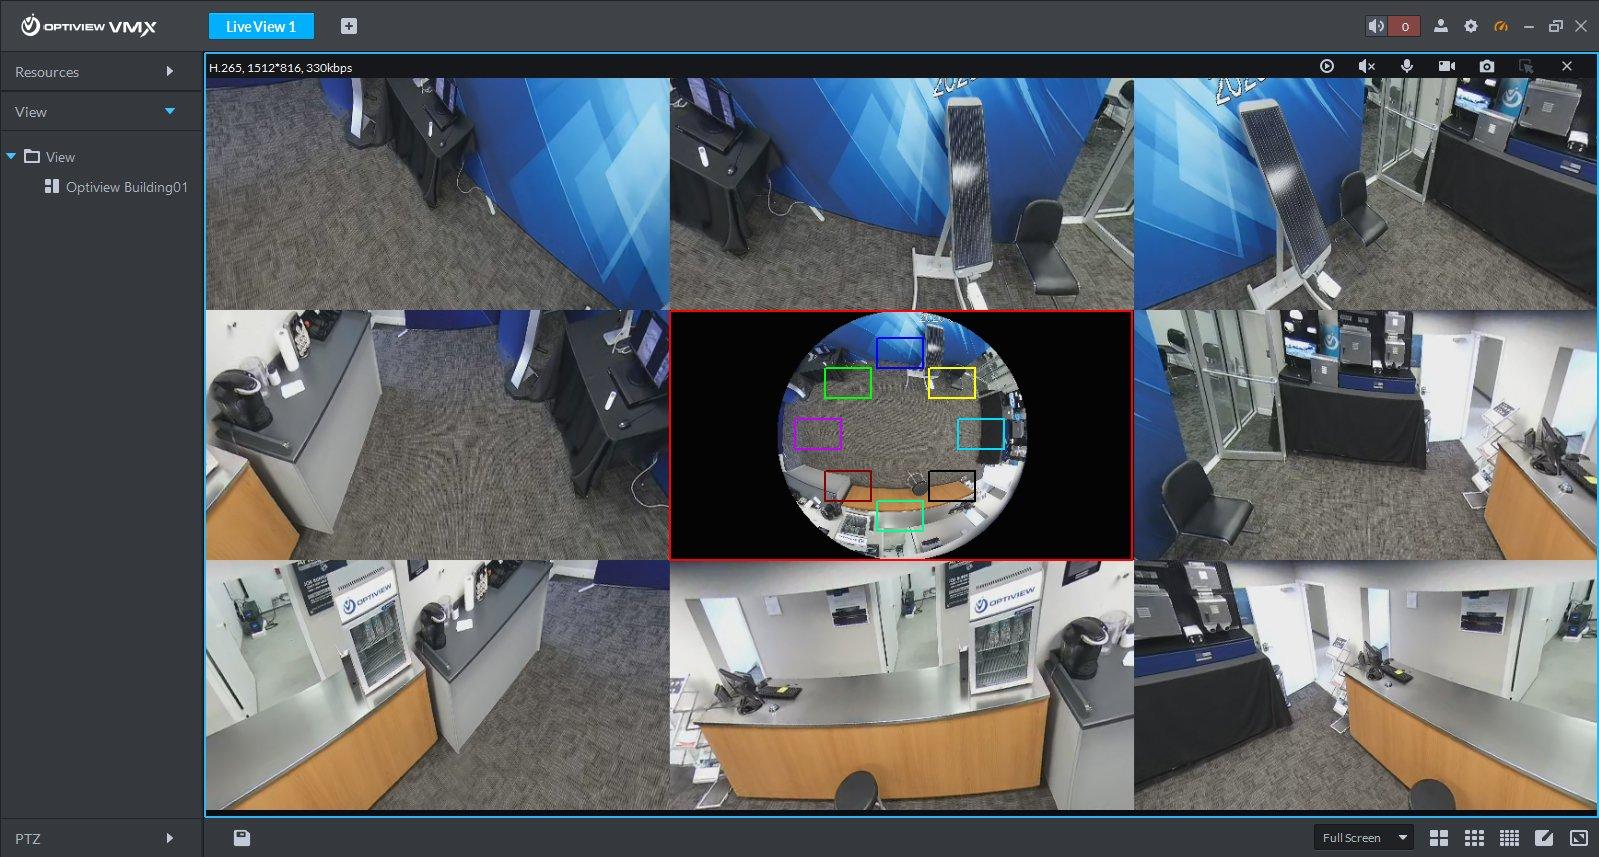 Dewarp Fisheye cameras in live view and playback